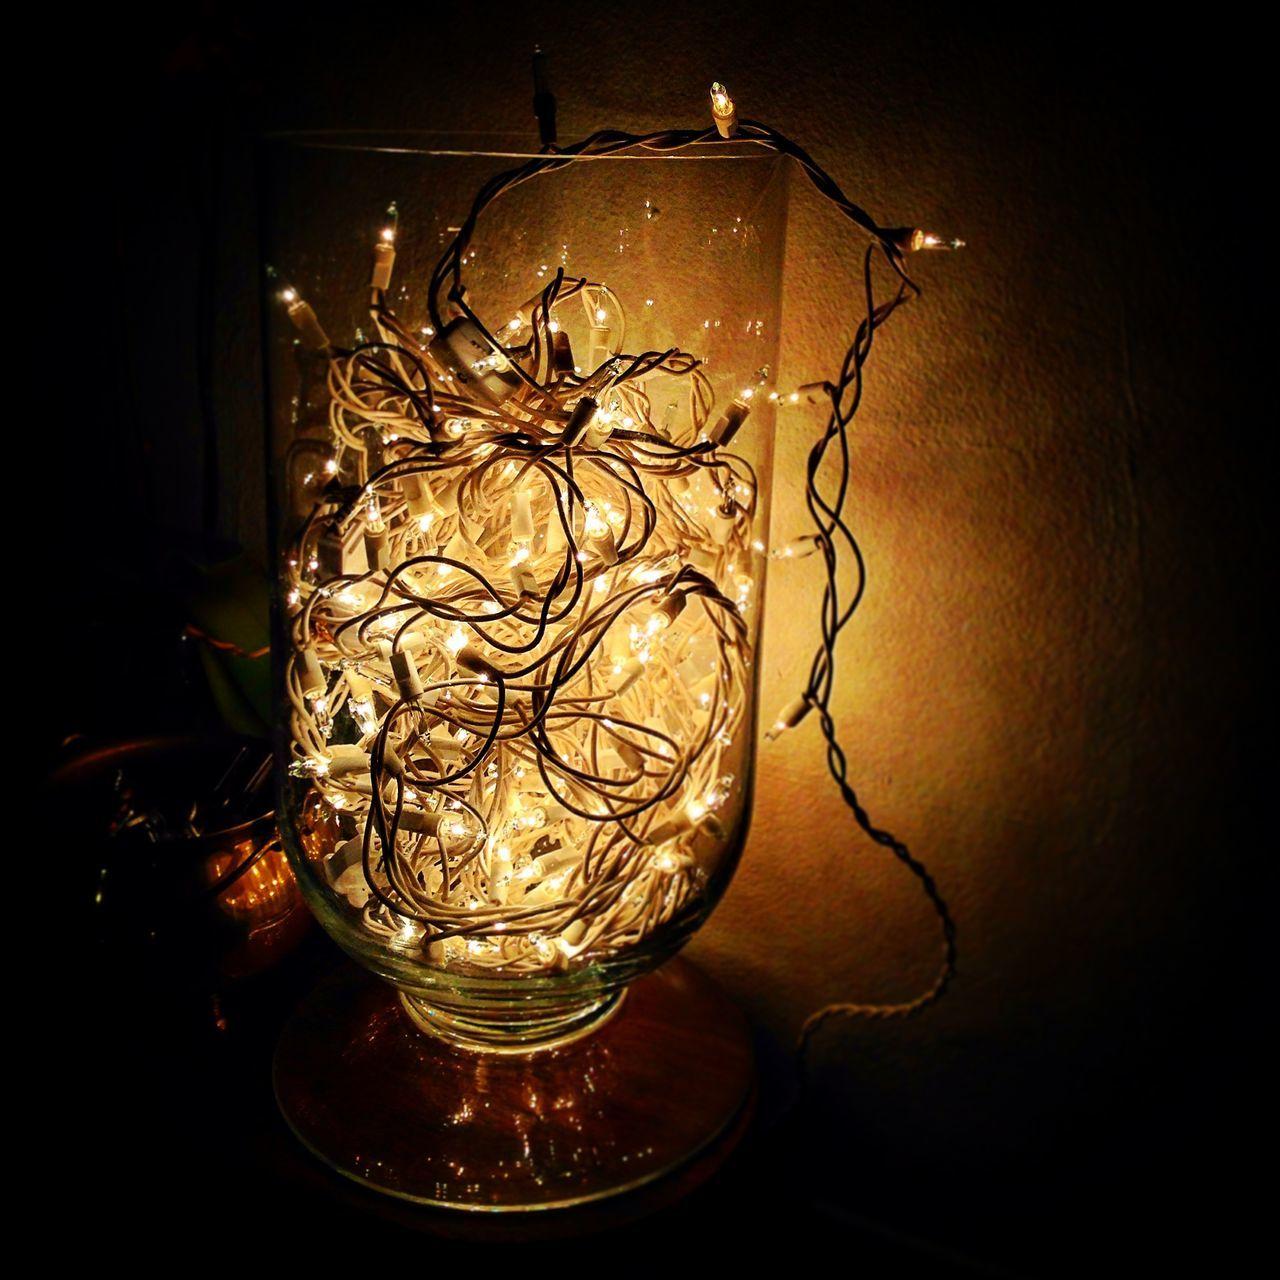 illuminated, decoration, lighting equipment, christmas, indoors, christmas decoration, close-up, no people, celebration, table, electricity, christmas ornament, night, hanging